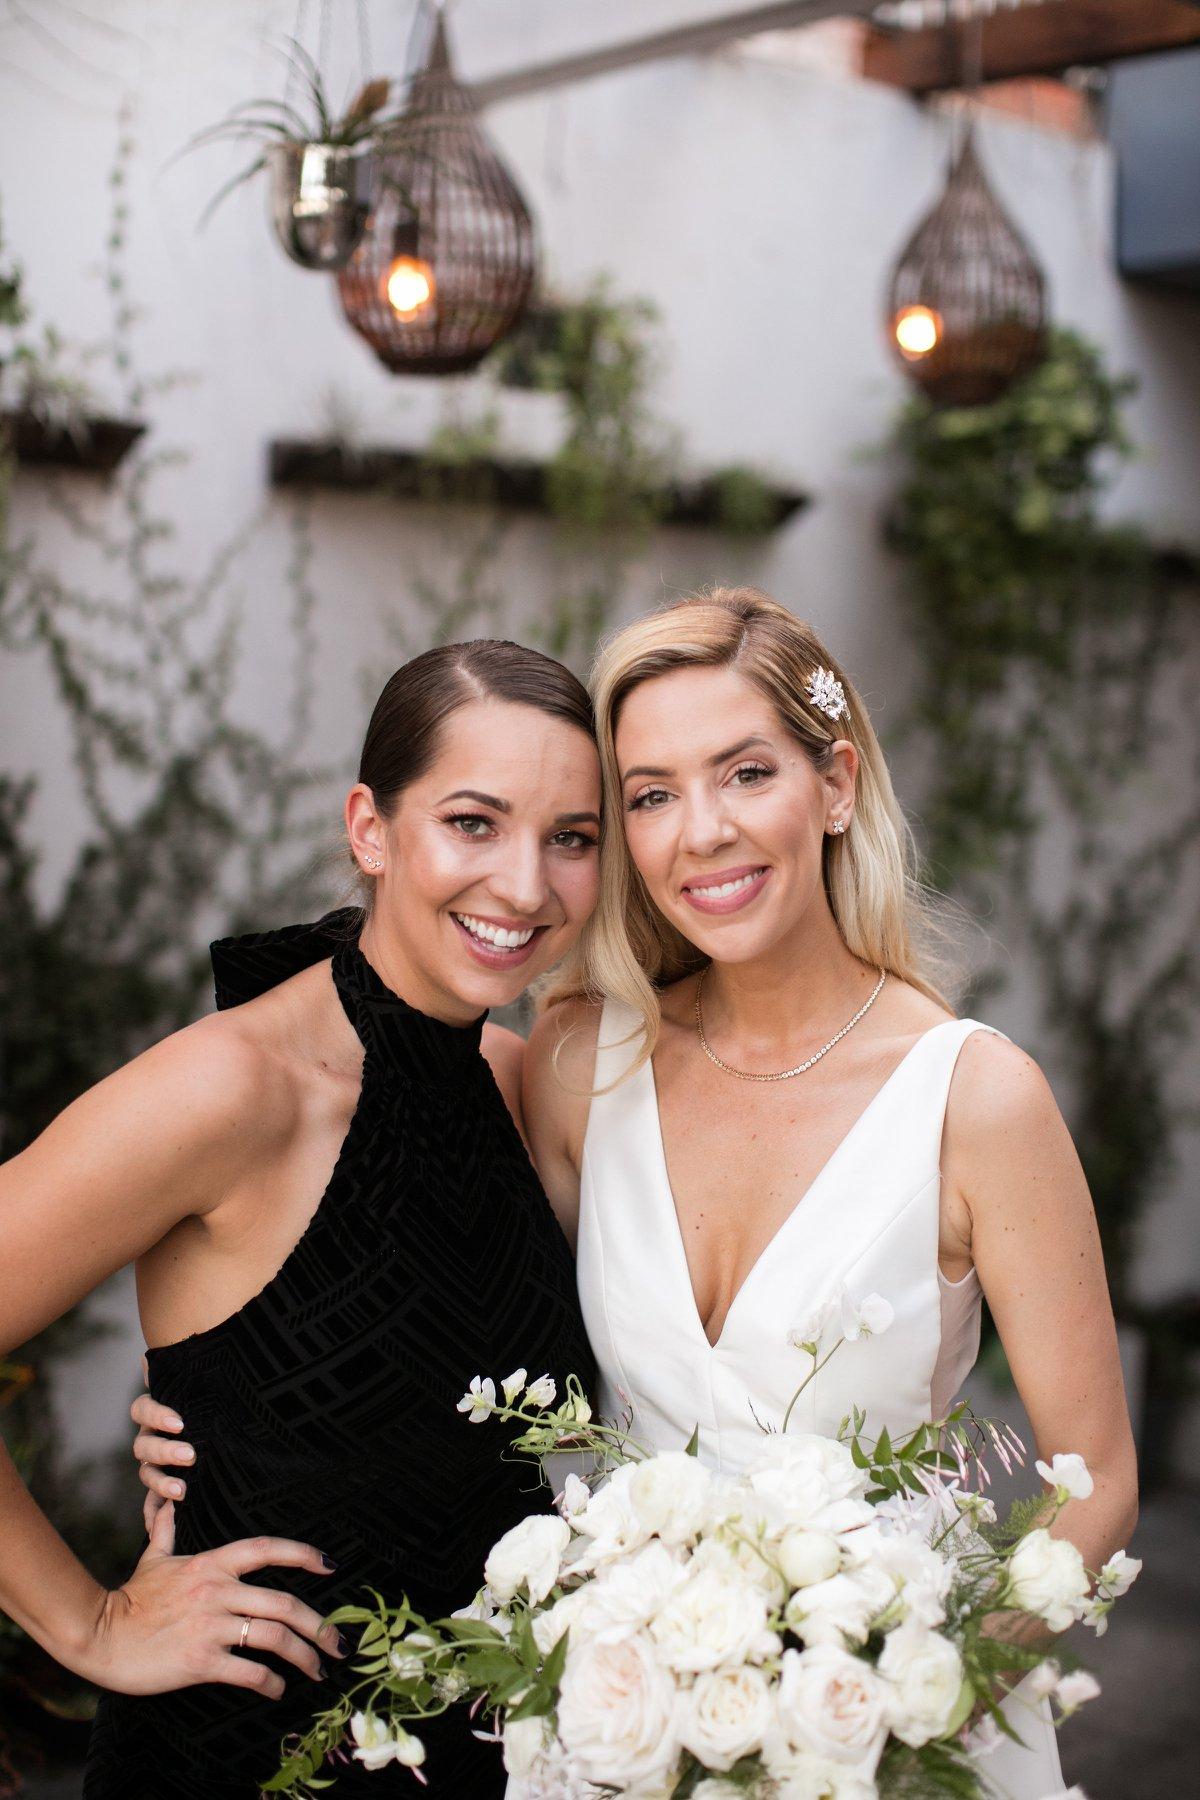 jaclyn smith bachelorette and wedding spraytan